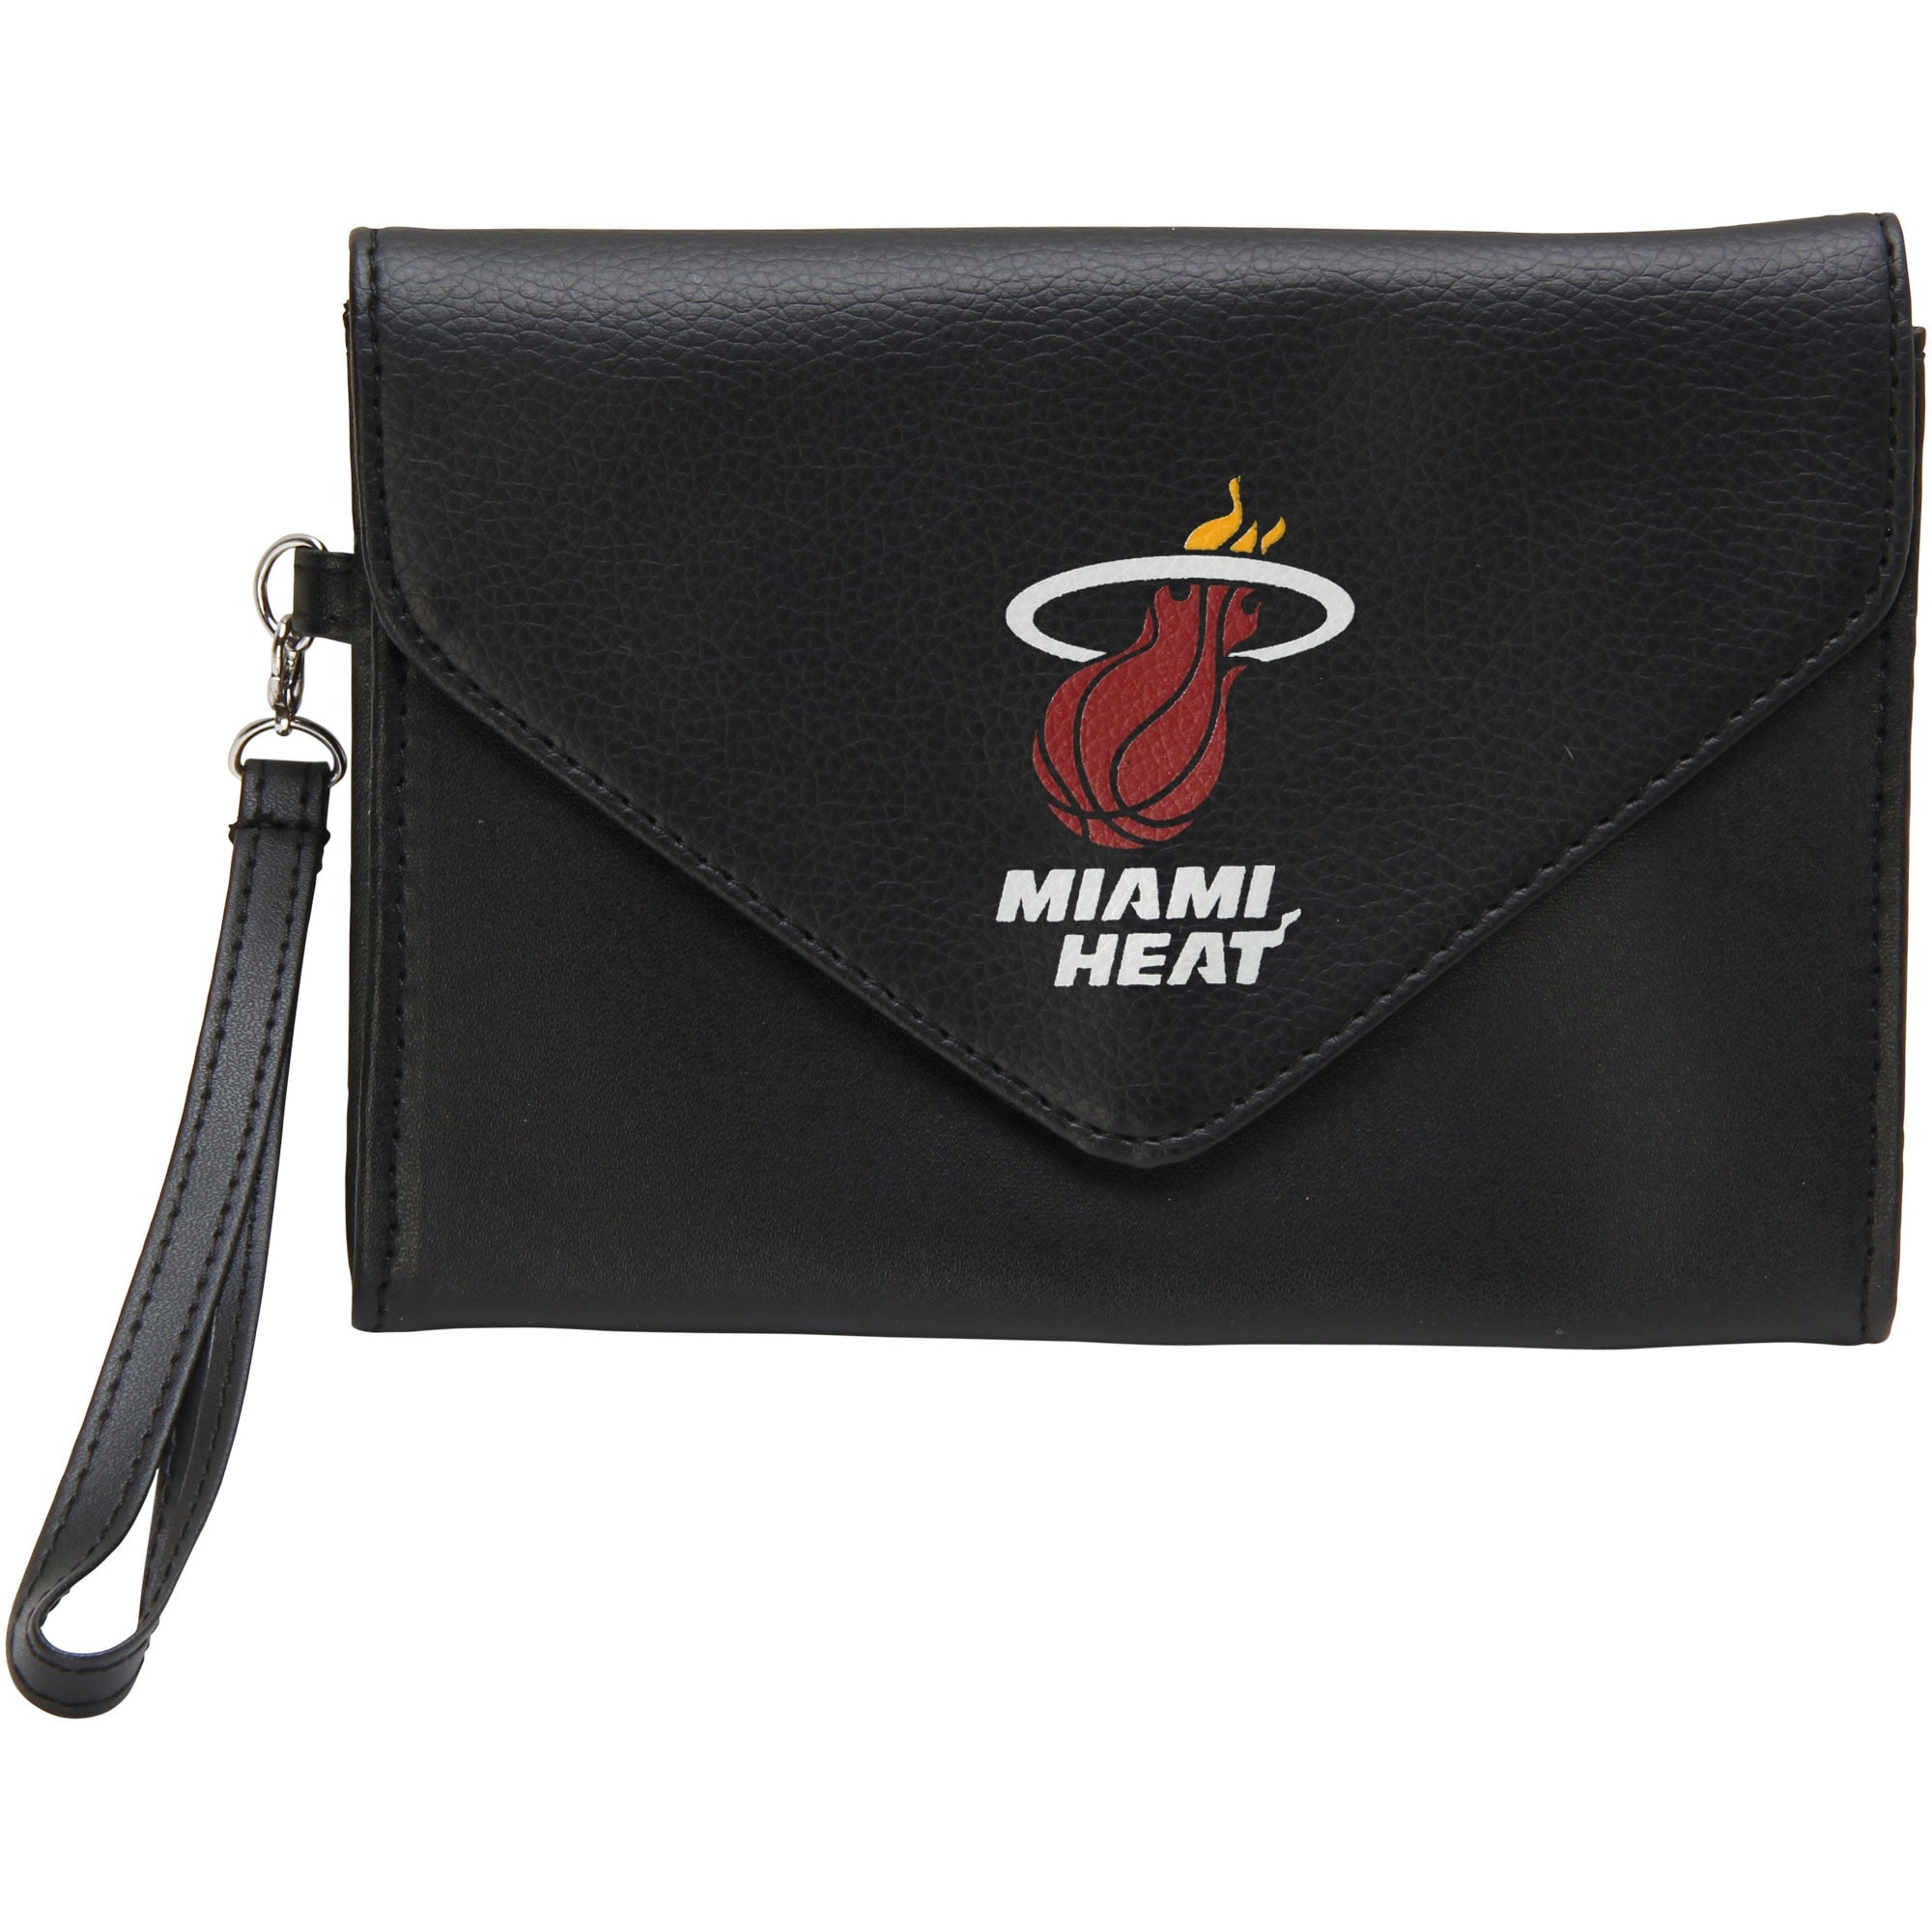 Miami Heat Women's Gibson Clutch - Black